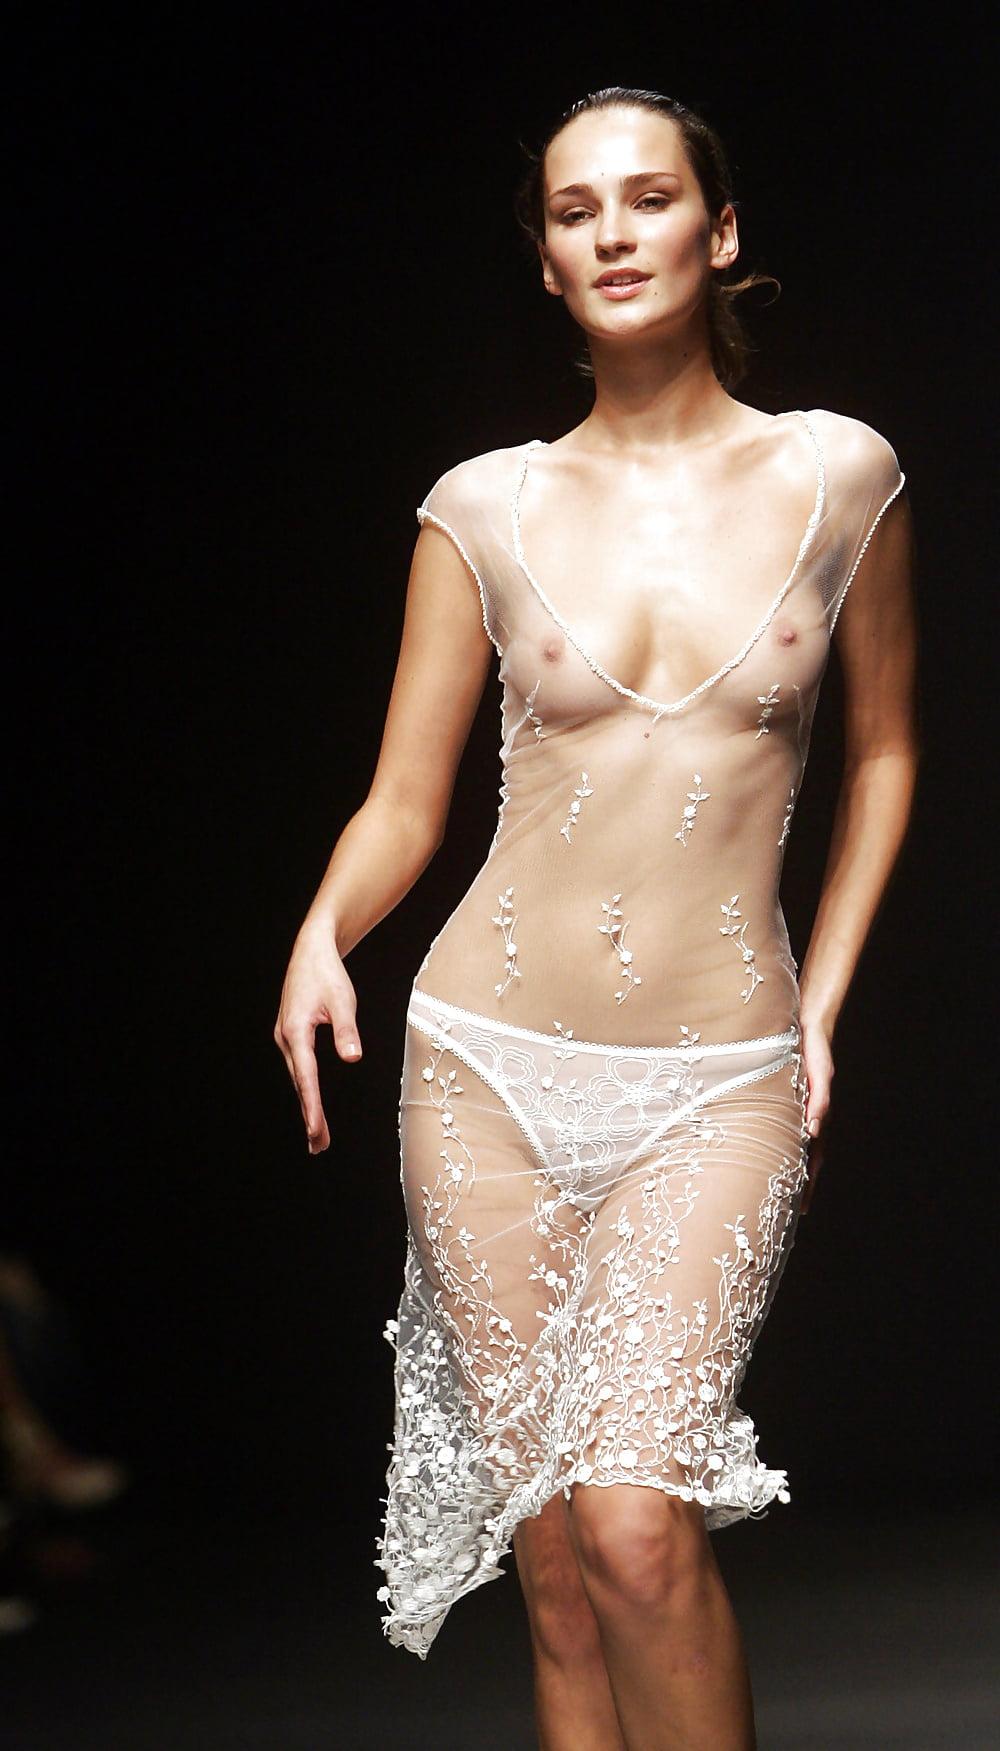 Warm Catwalk Models Nude Photo Shoots Gif